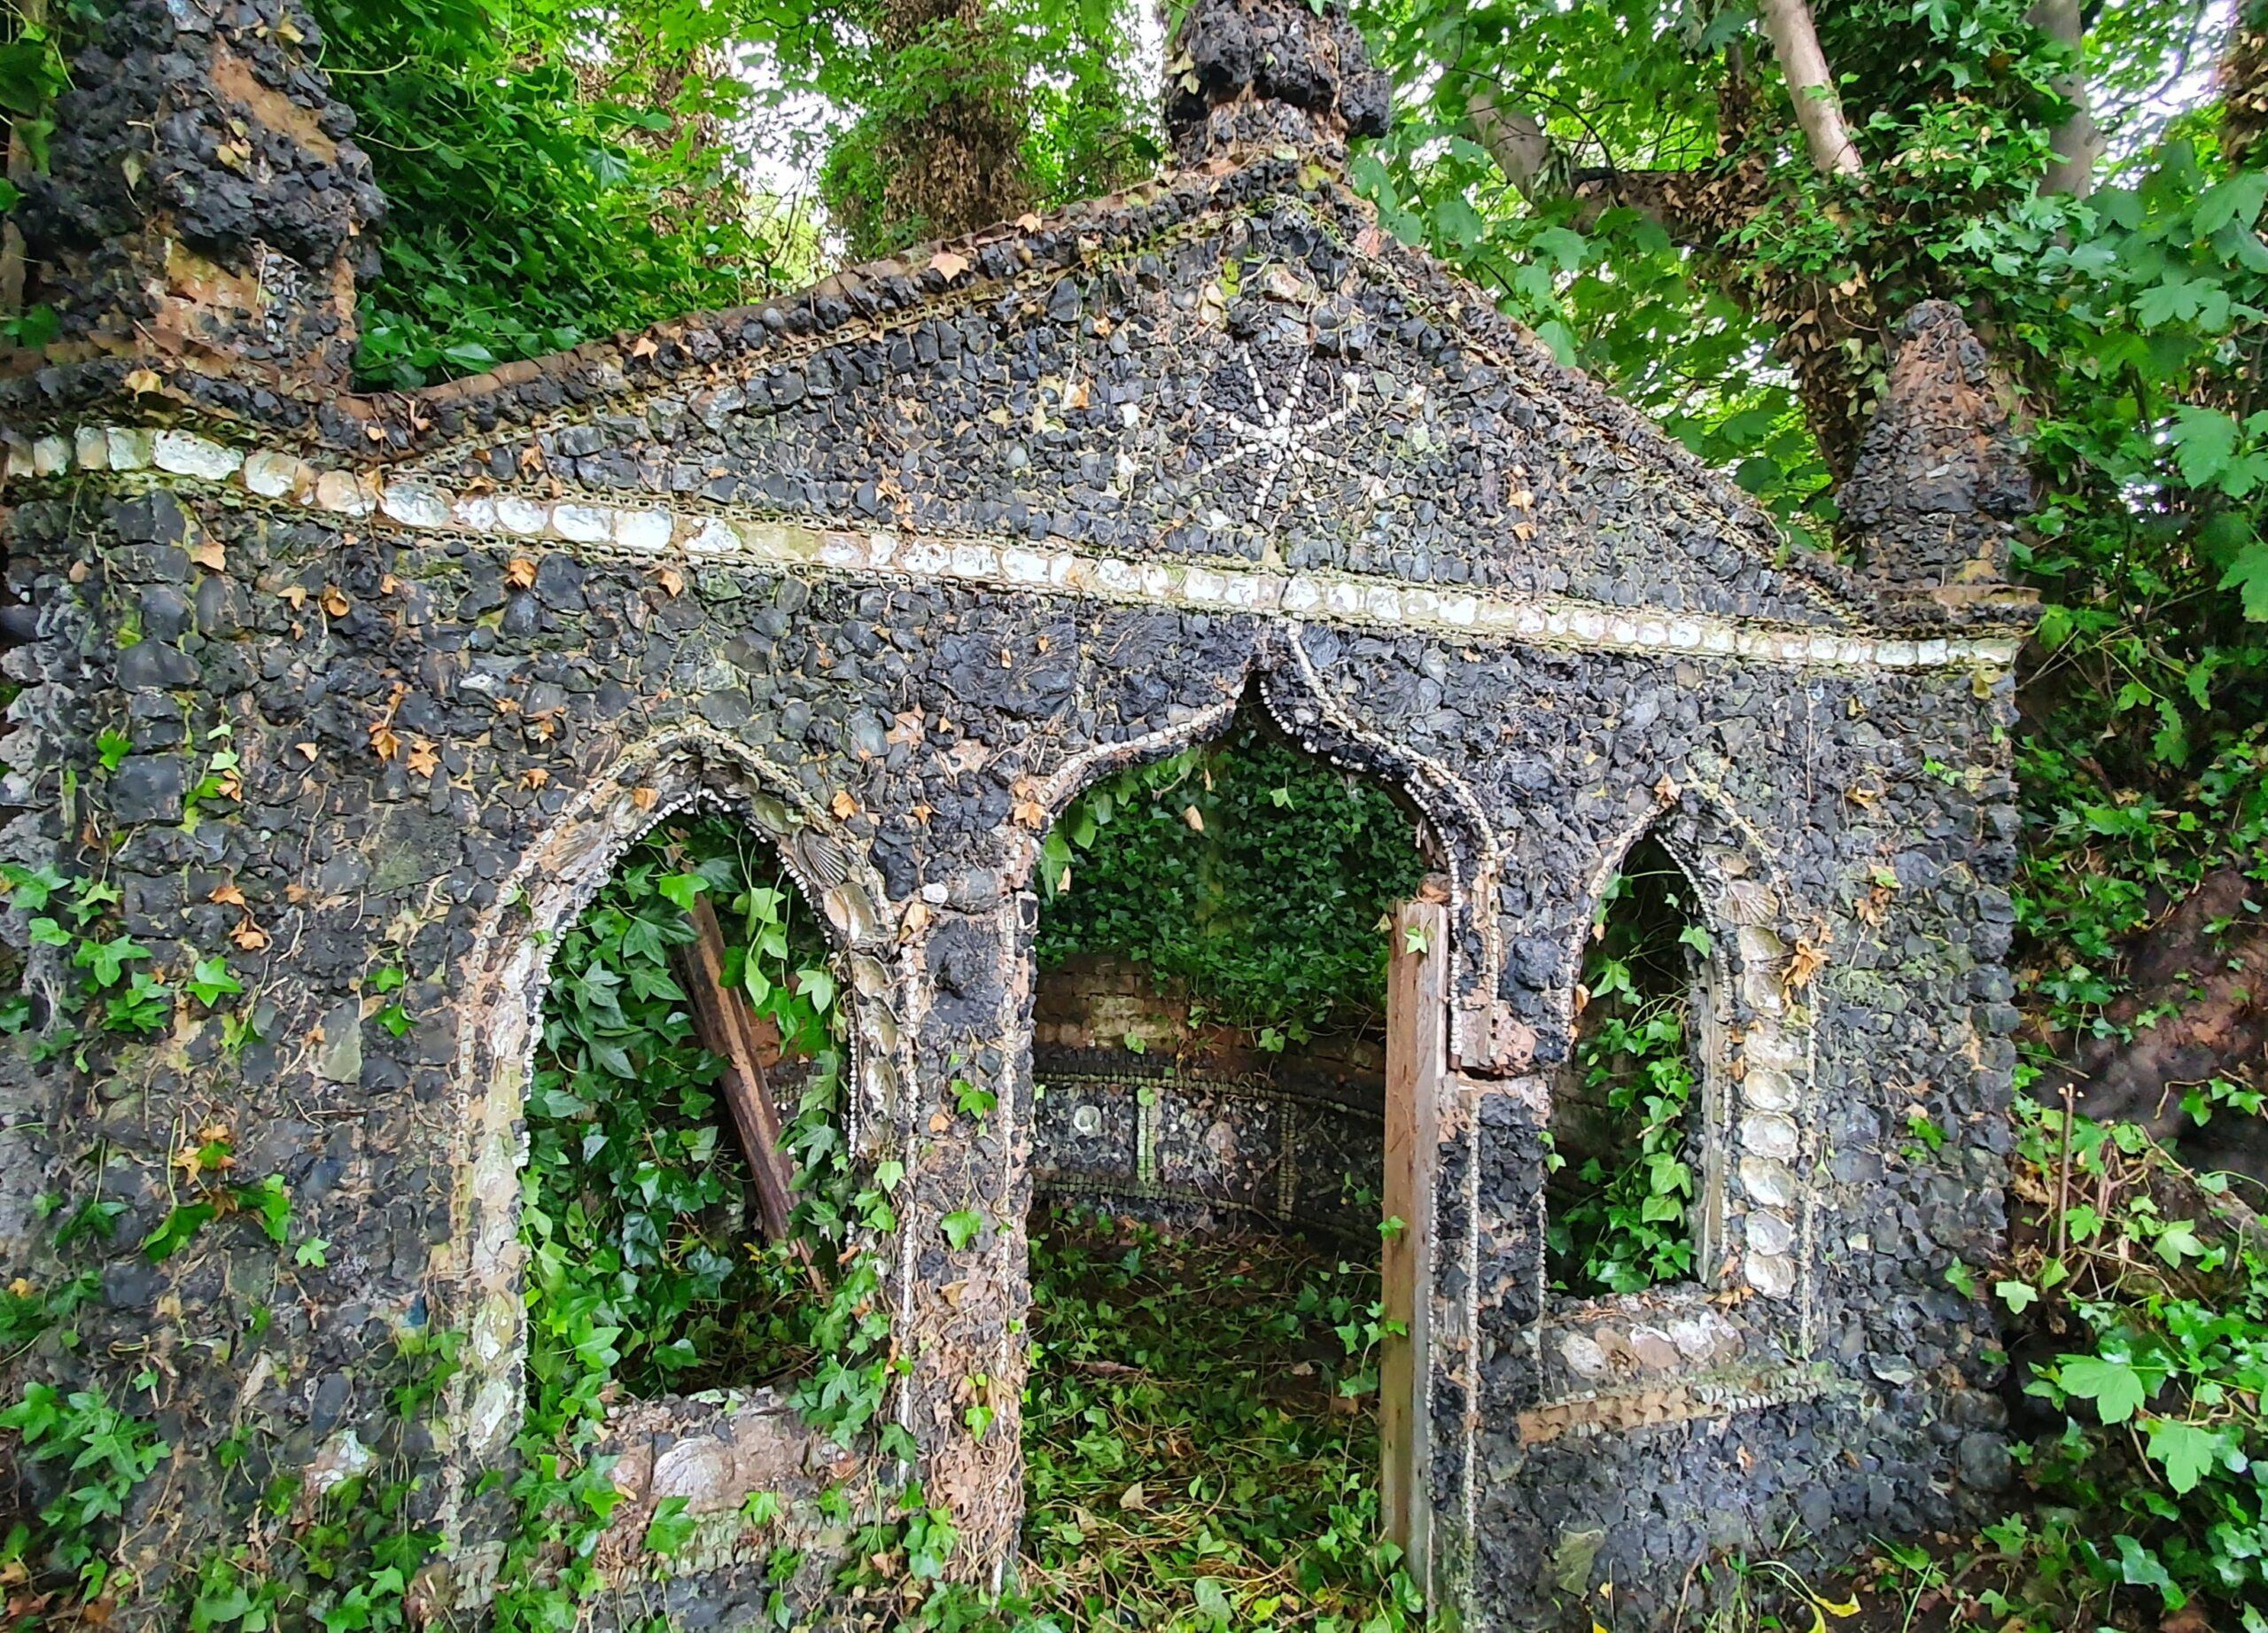 Grotto found at the bottom of a garden in Edgbaston